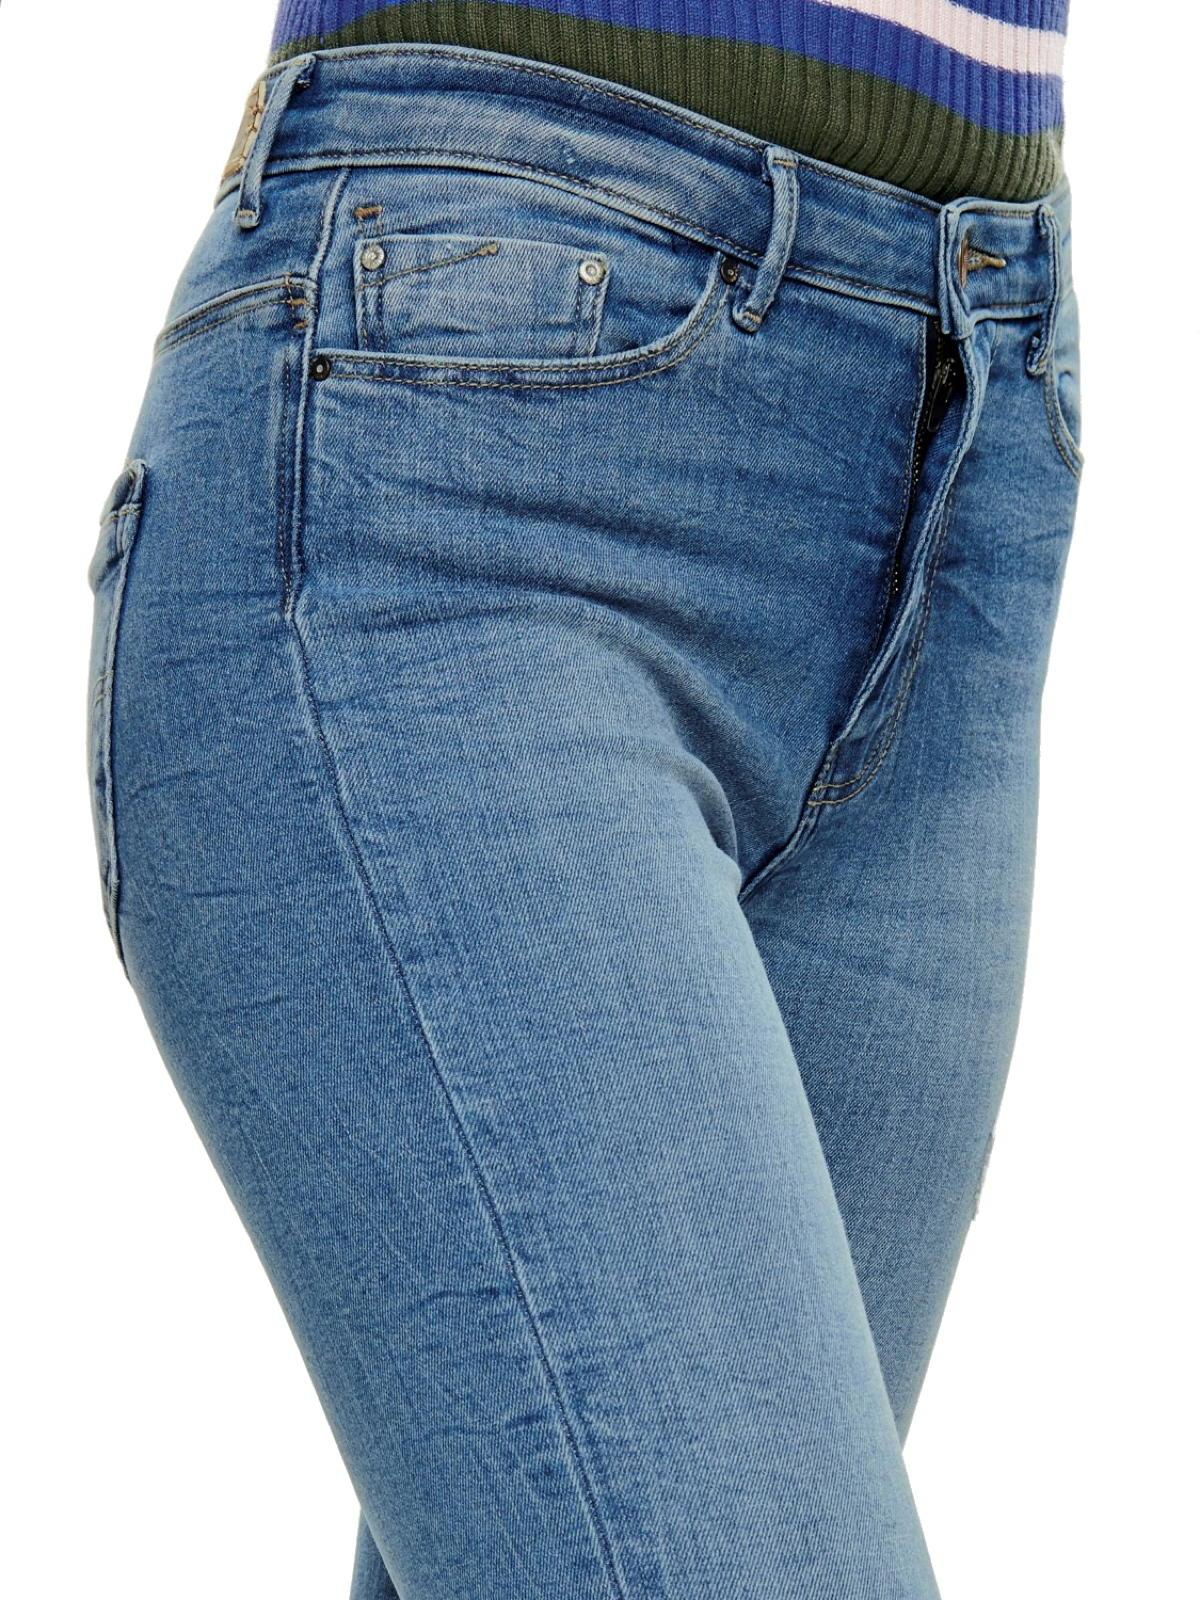 L34 Only Damen Hose Skinny Stretch-Jeans onlPAOLA Highwaist Denim hellblau L30